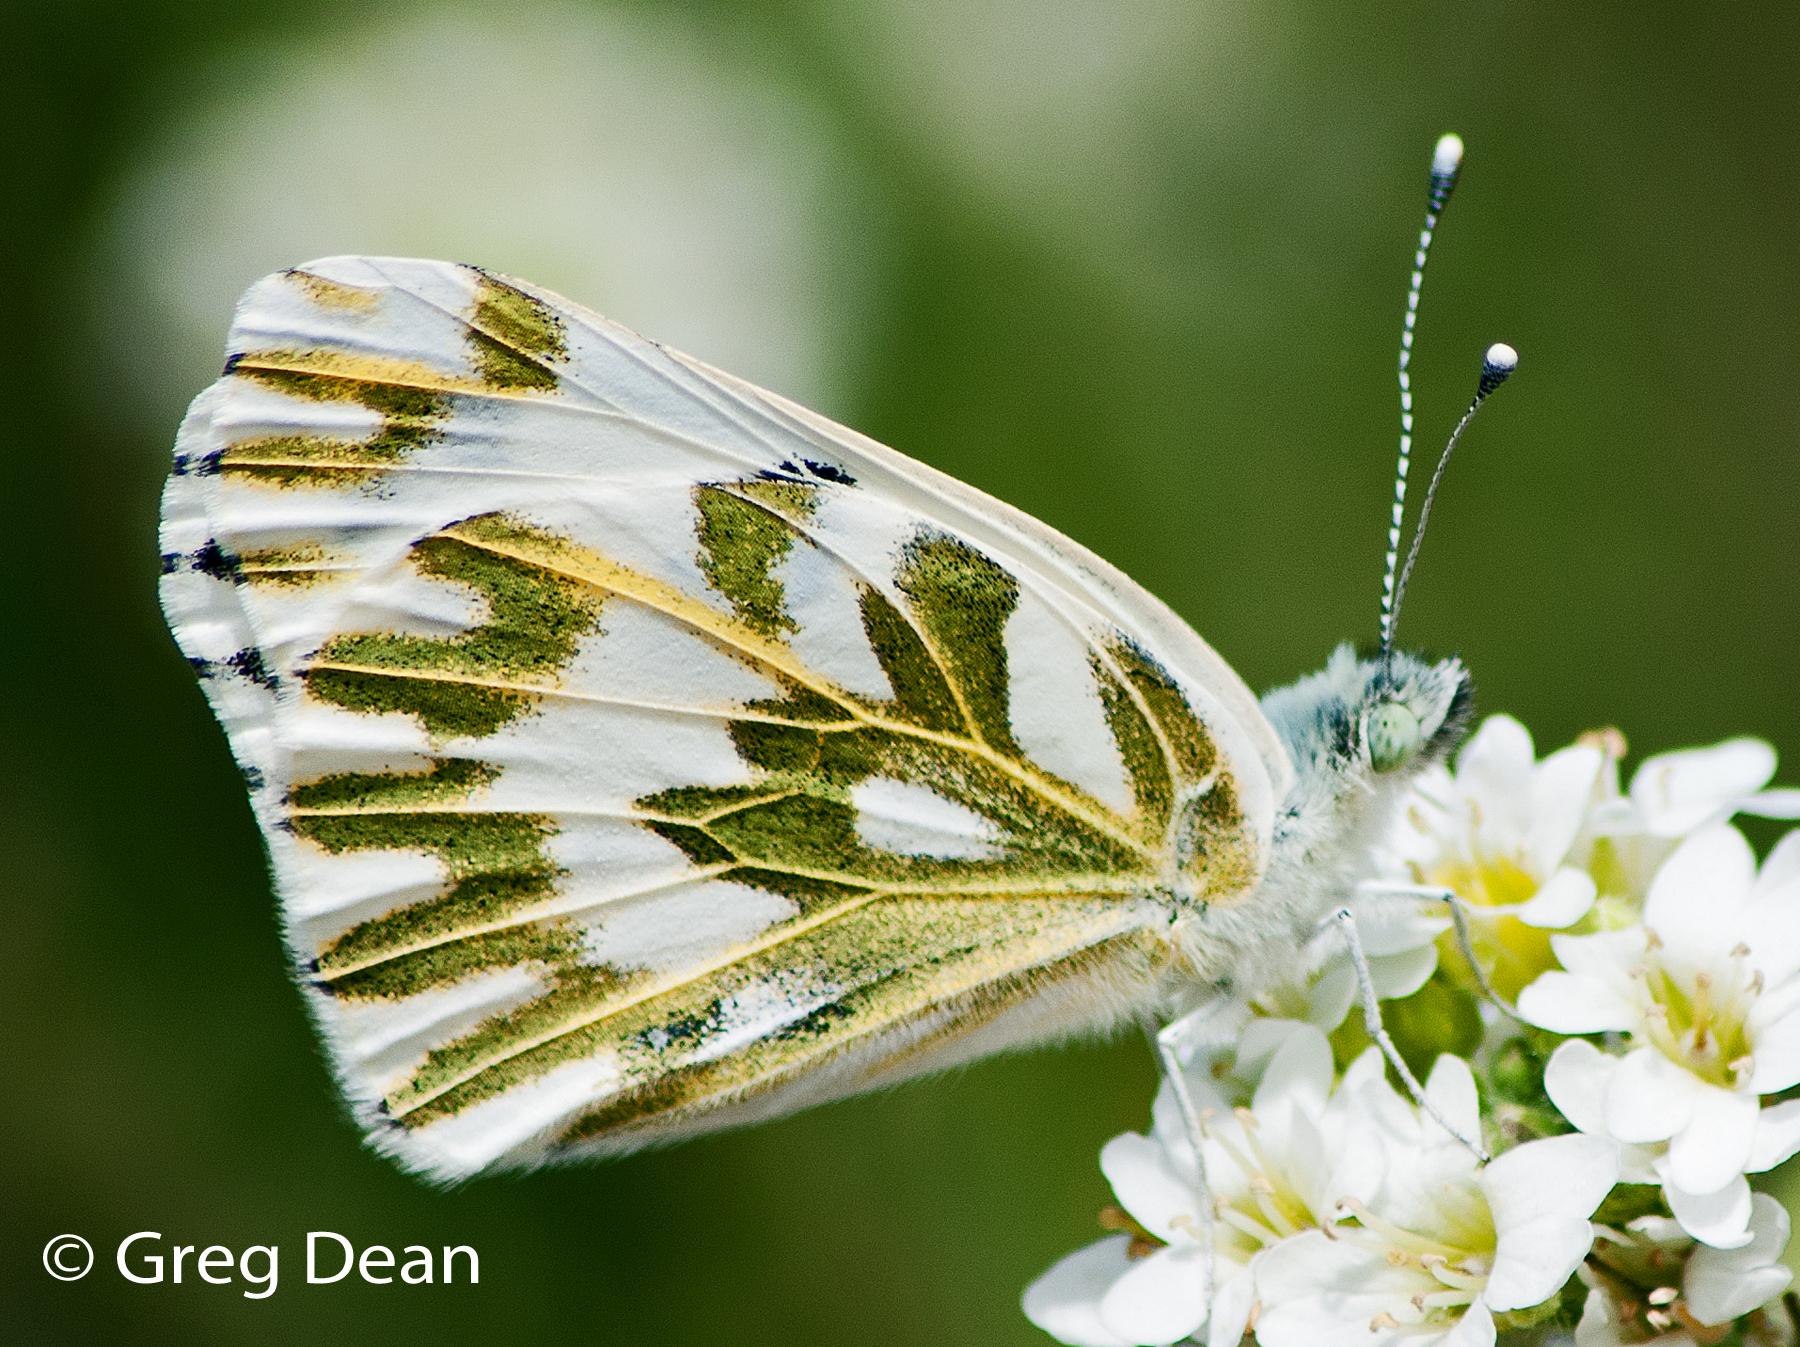 Sưu tập Bộ cánh vảy 3 - Page 5 _dsc9738_unidentified_butterfly_cropped_0